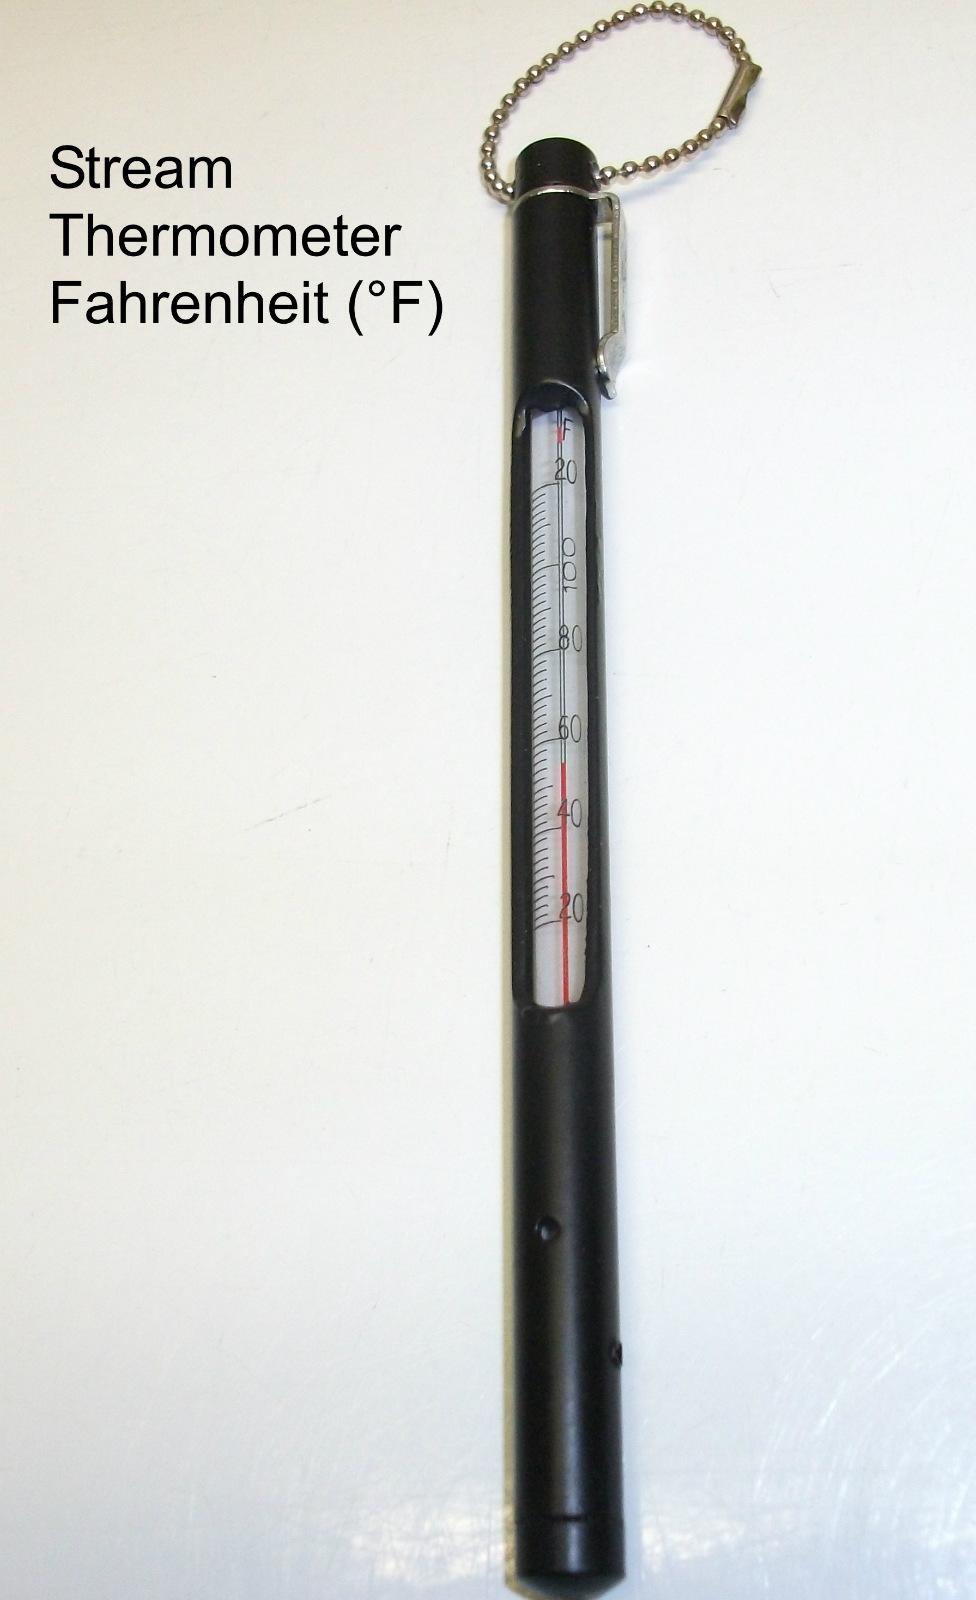 Wholesale Fly Company : Stream Thermometer - Fahrenheit (°F)